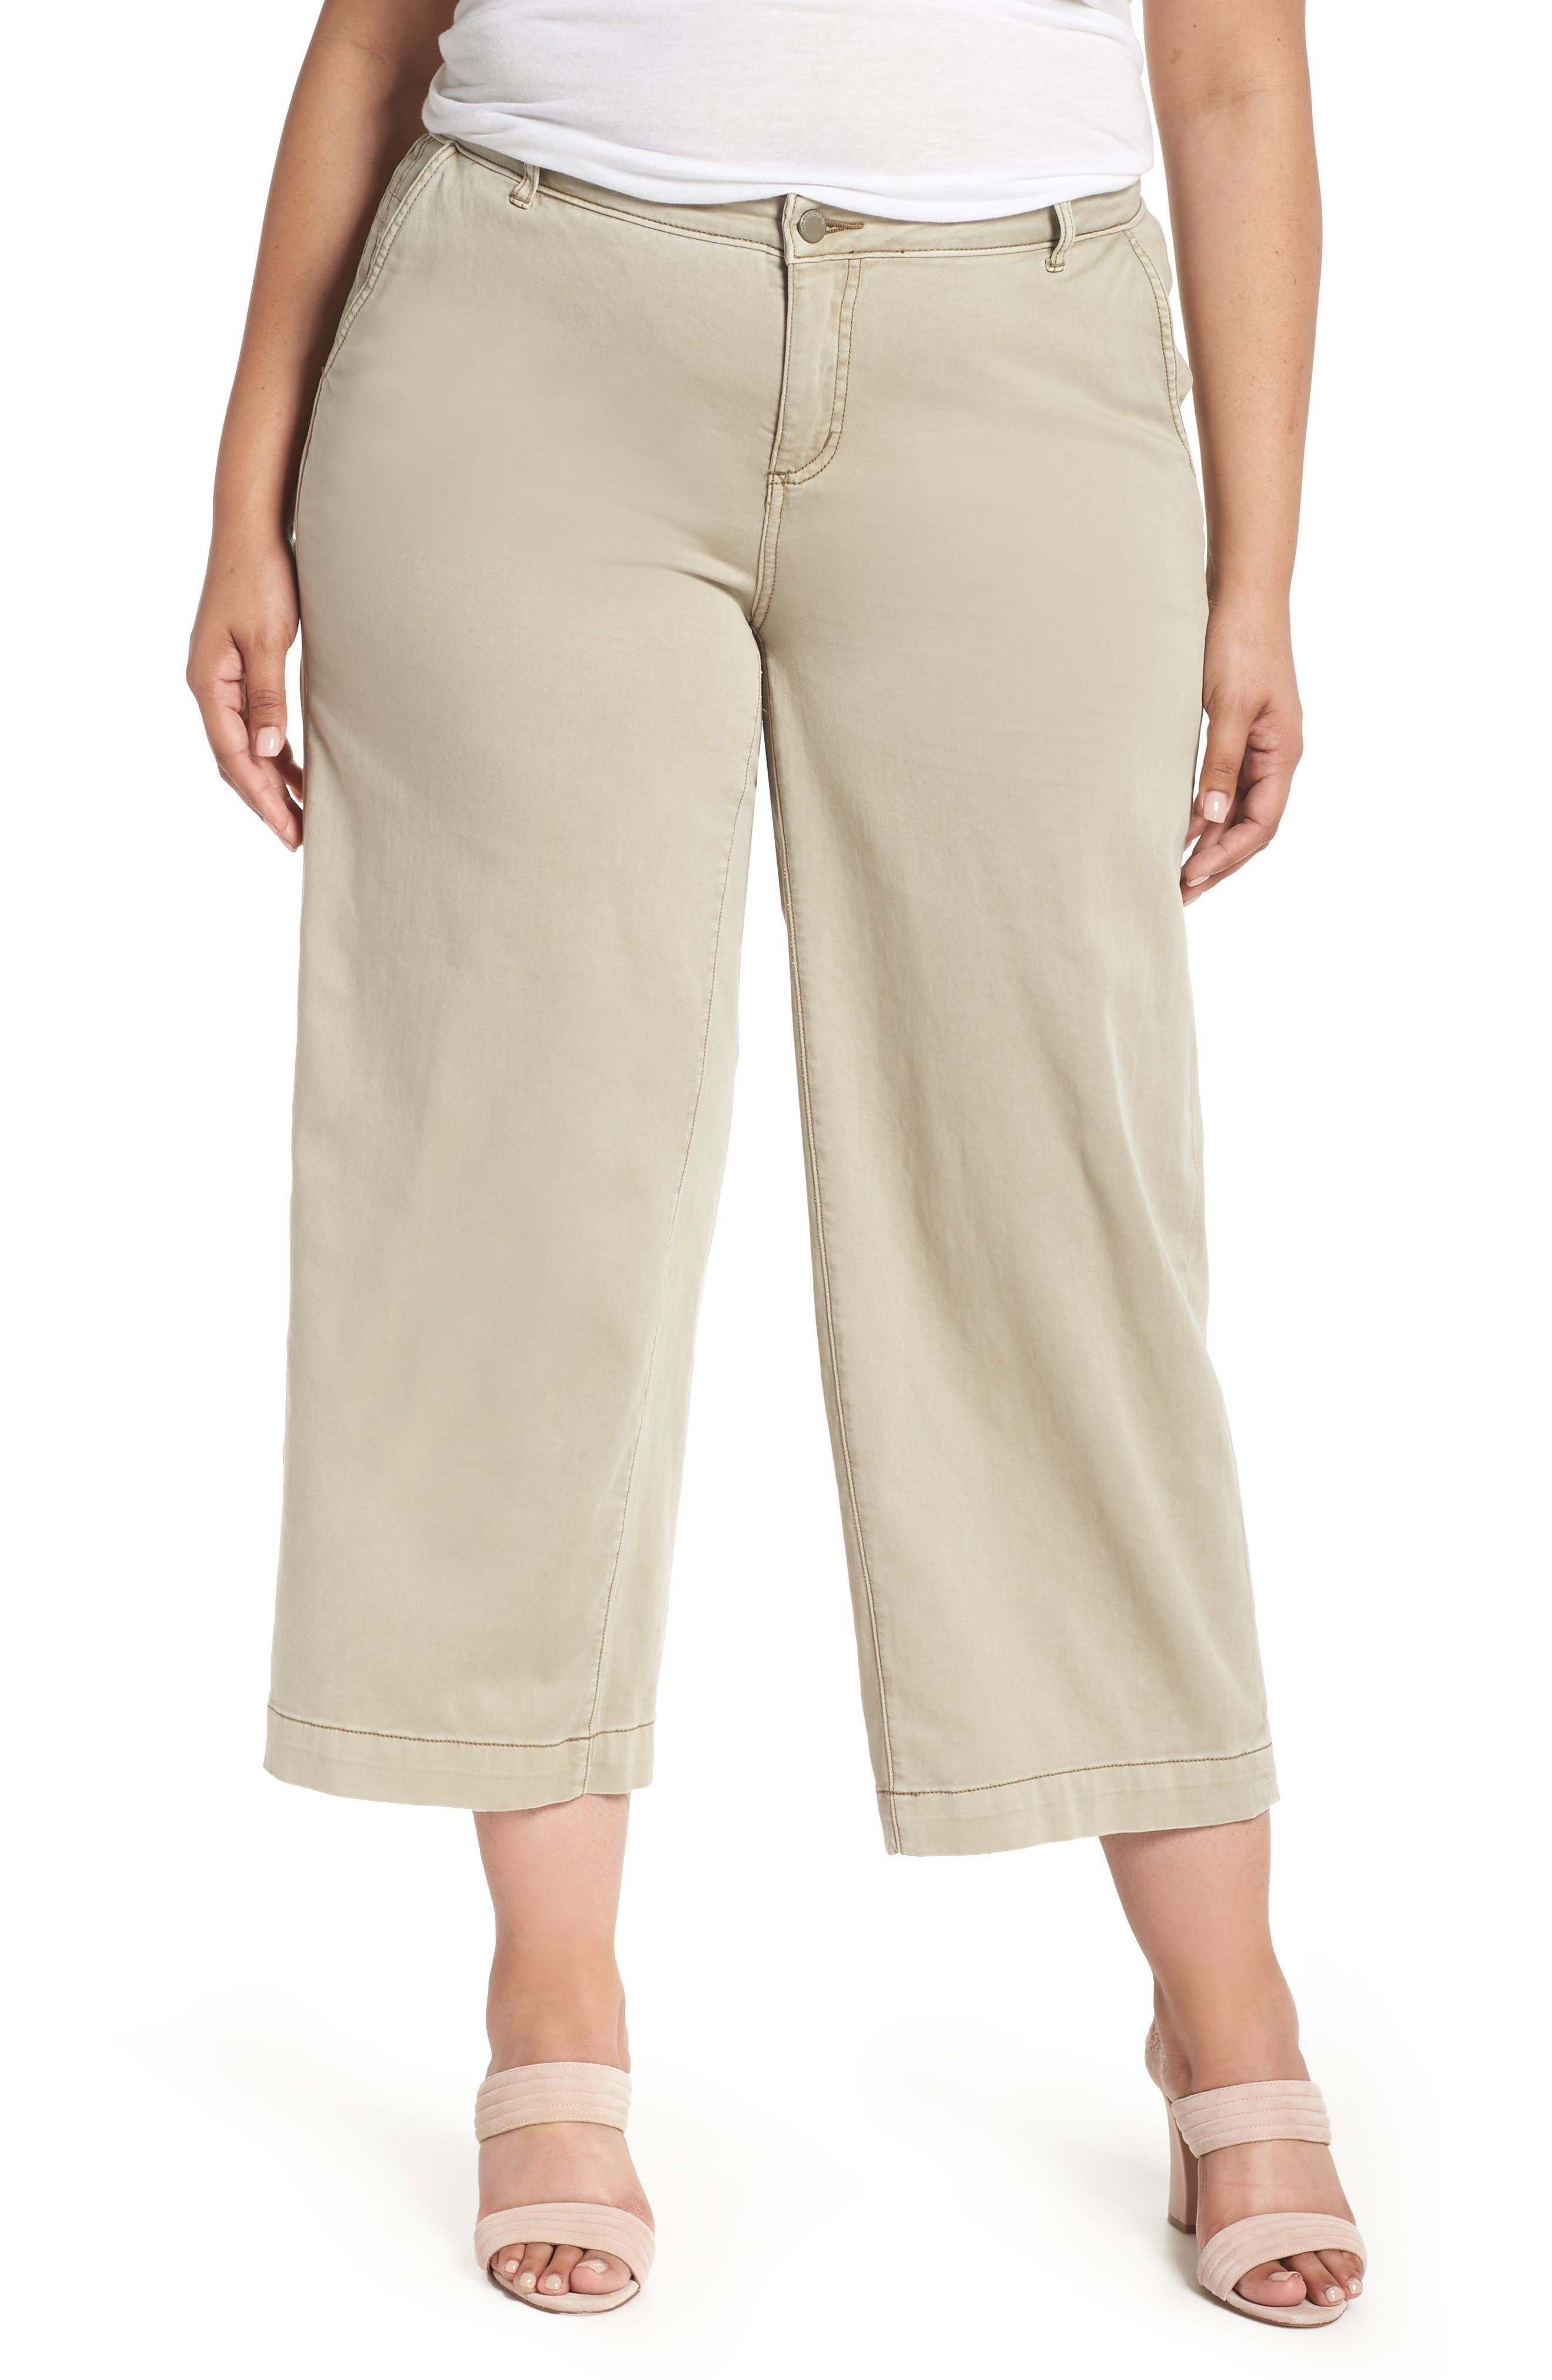 Wide Leg Stretch Cotton Twill Crop Pants,                             Main thumbnail 1, color,                             Tan Cobblestone